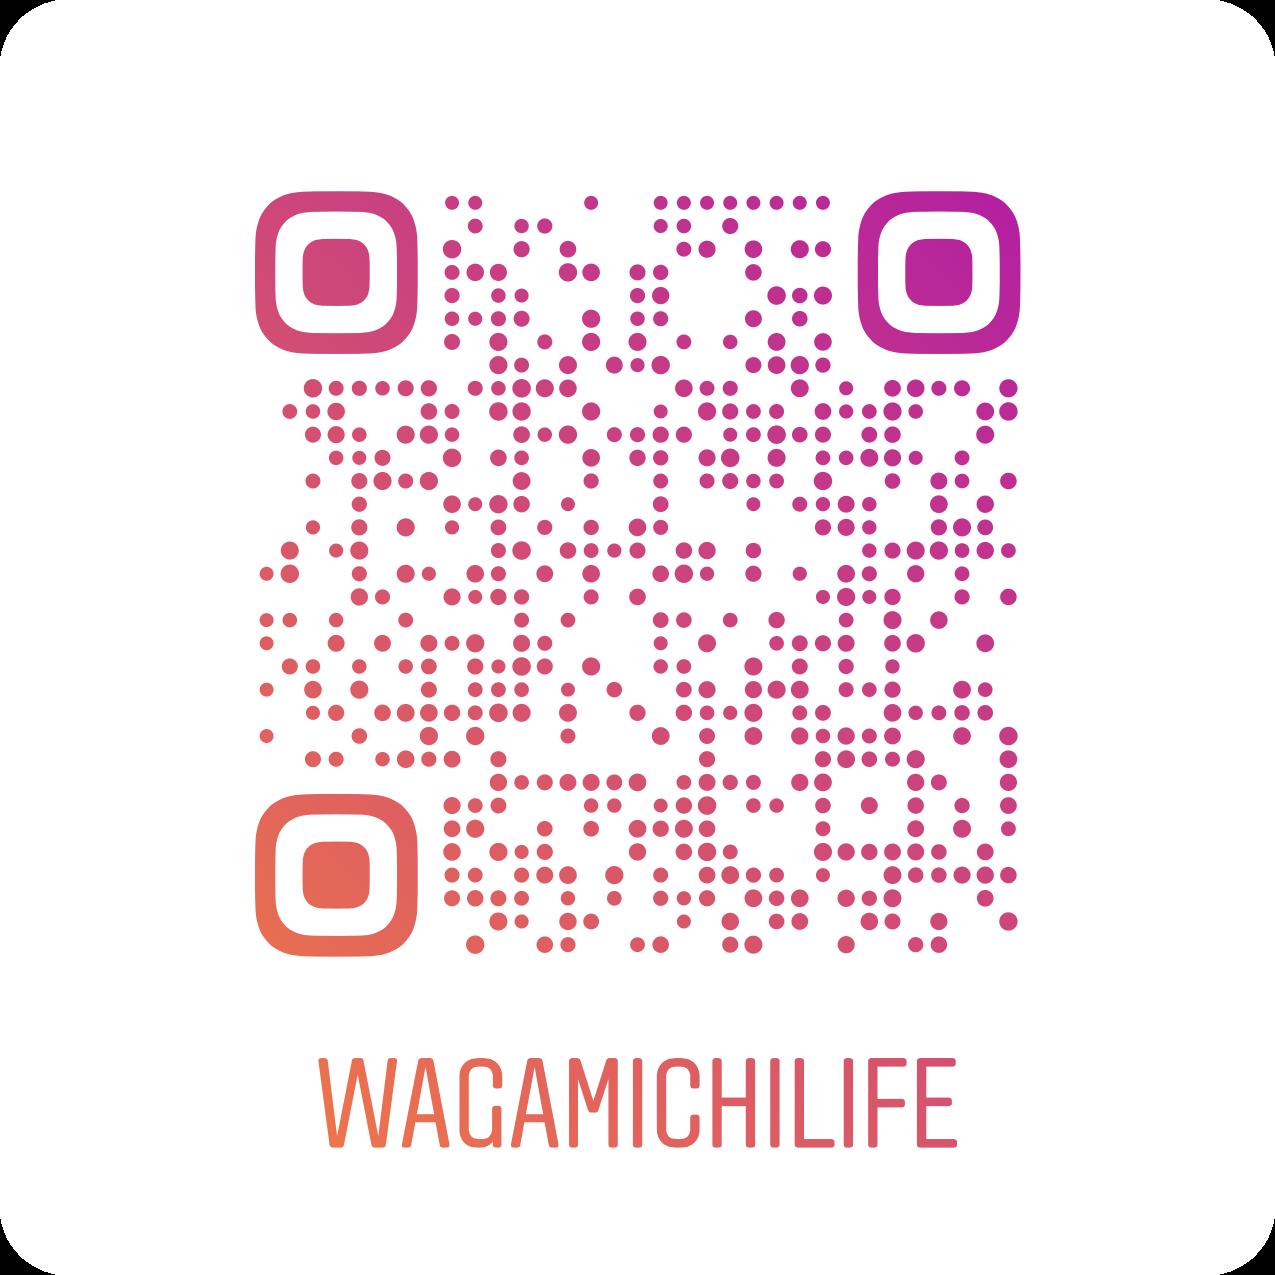 wagamichilife_nametag.png